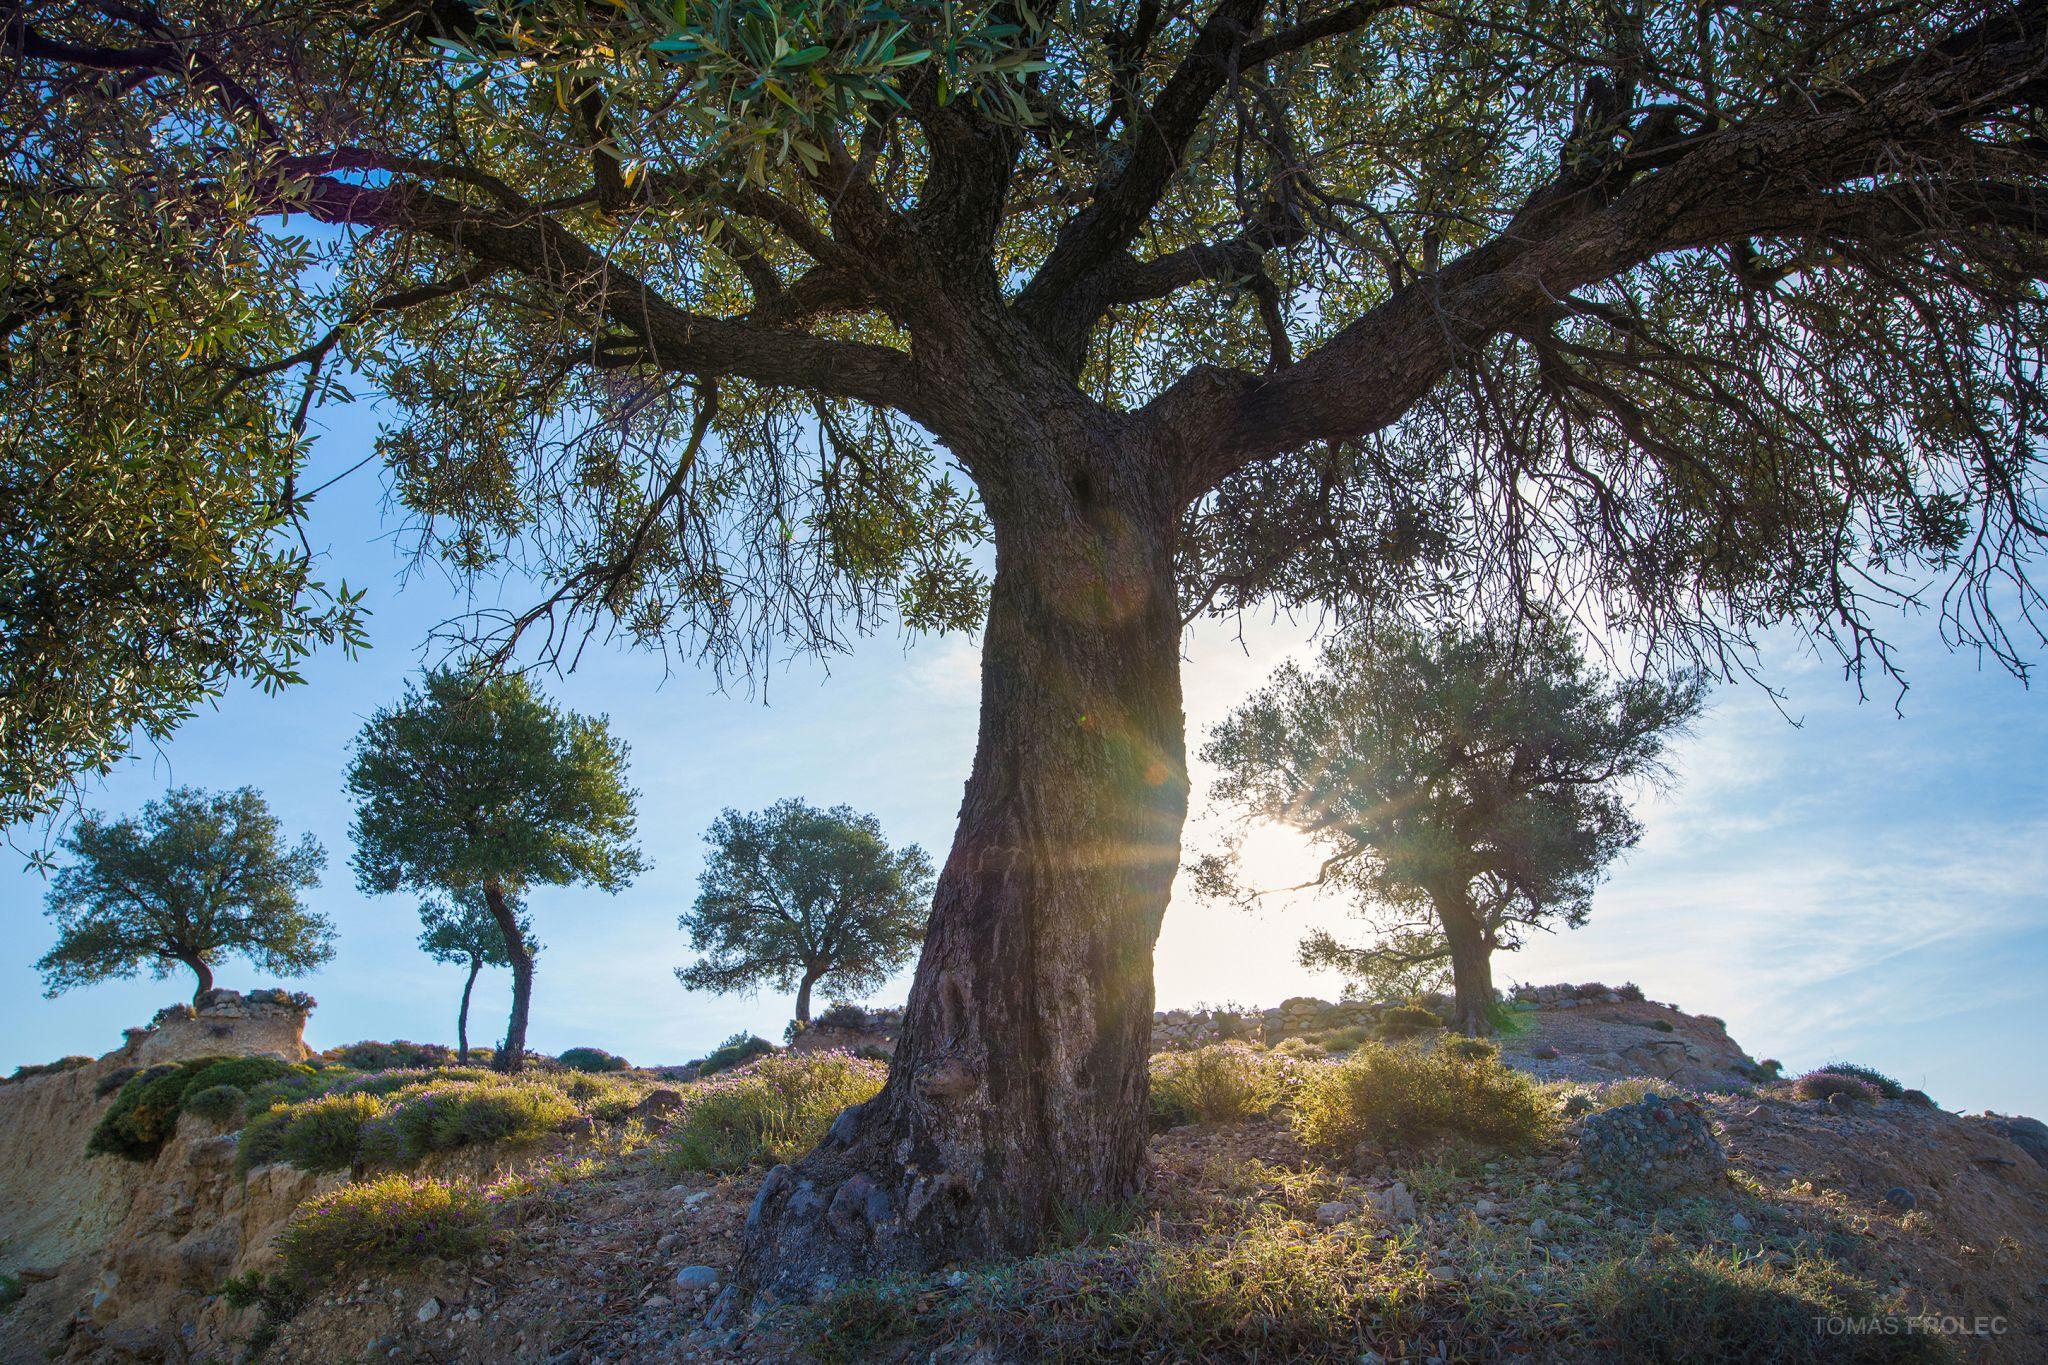 Archangelos, Greece